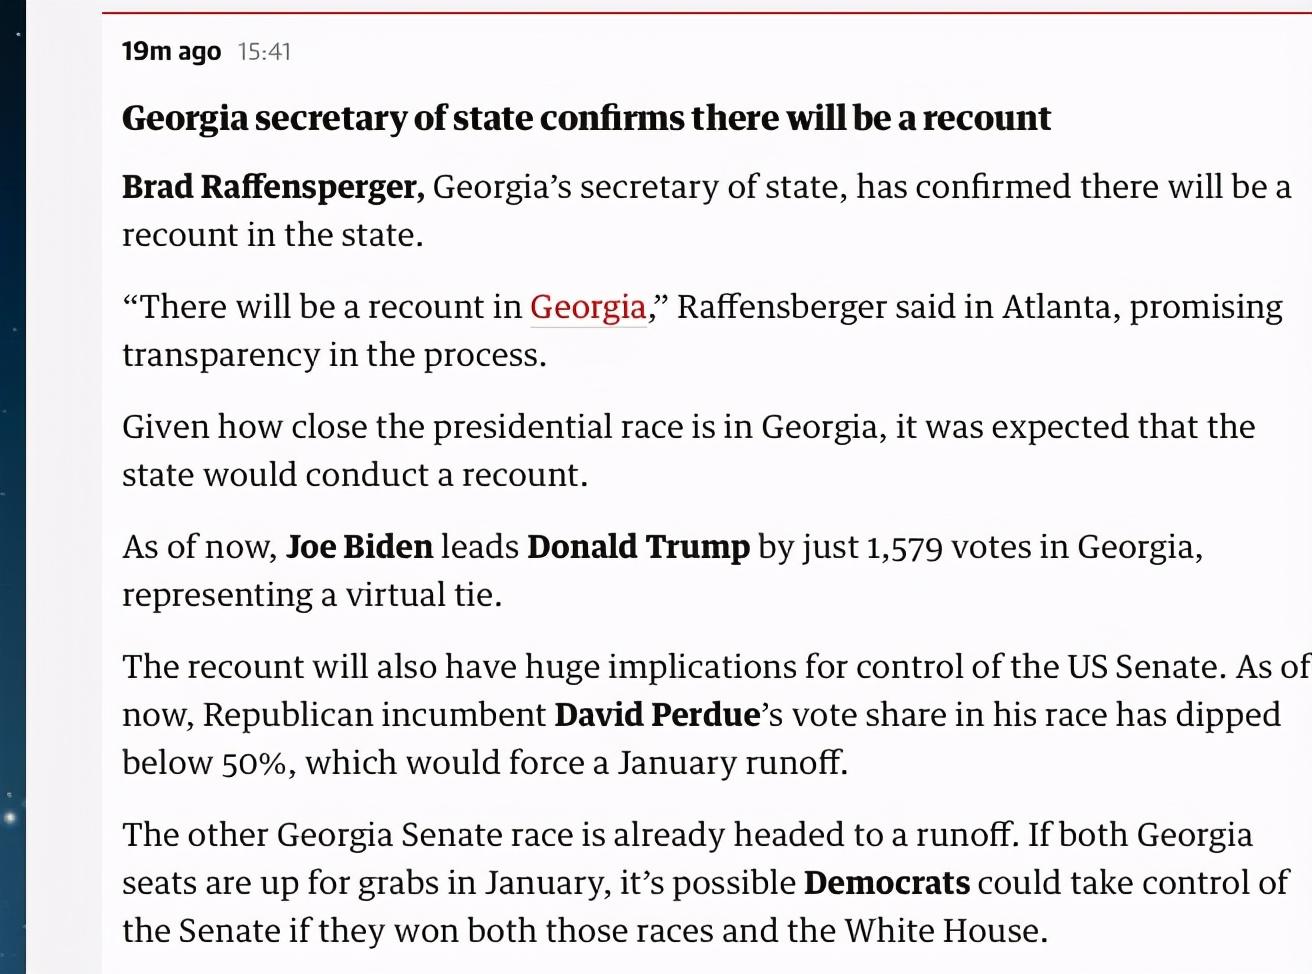 拜登翻蓝宾州,佐治亚却要重新计票?